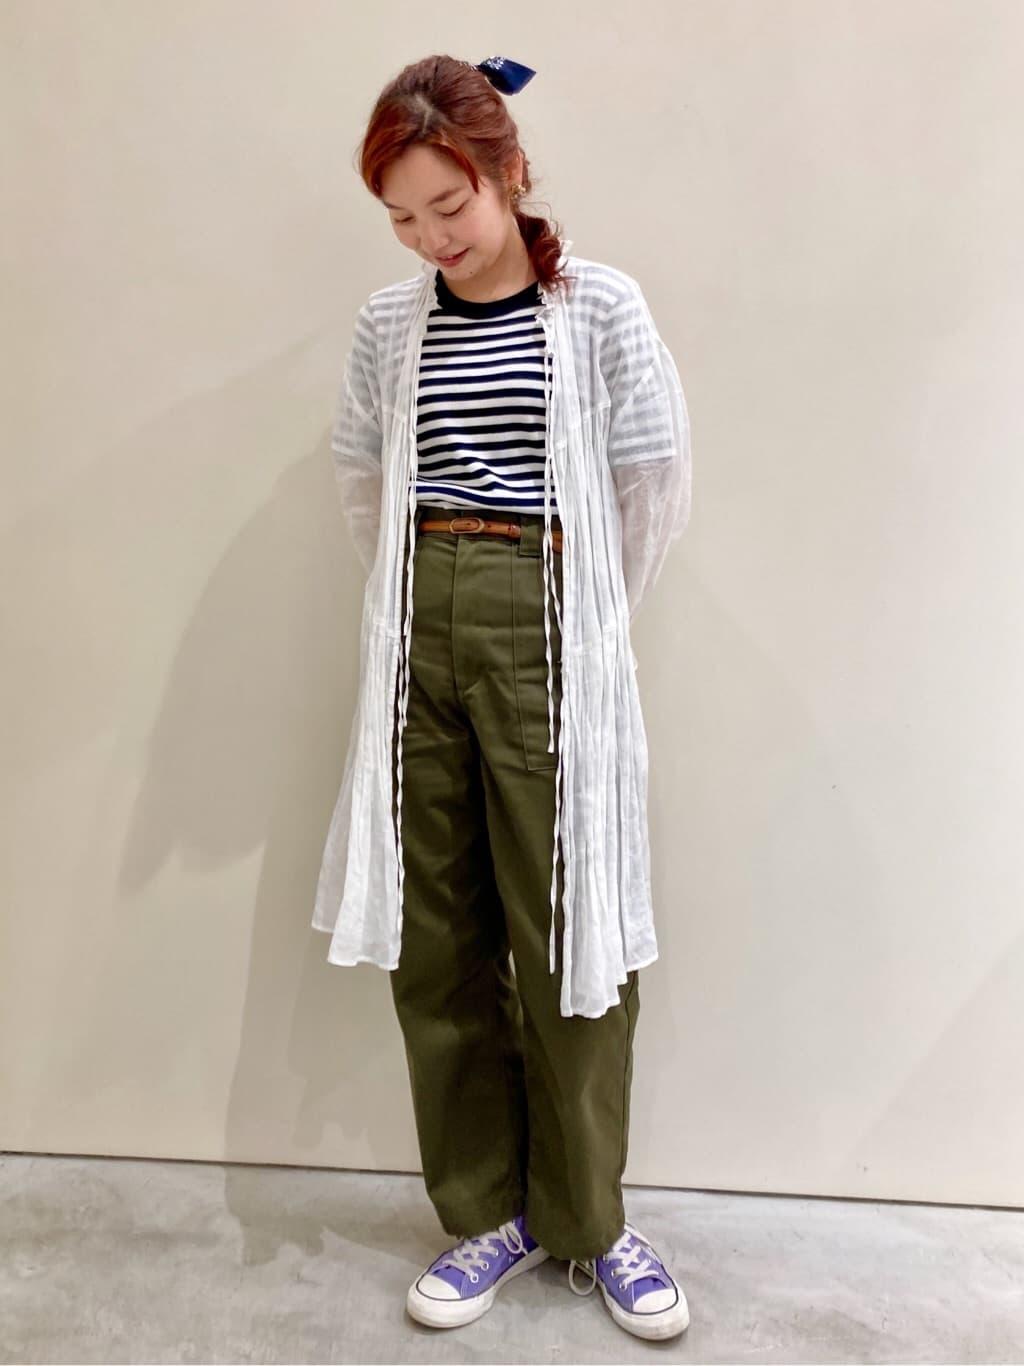 Dot and Stripes CHILD WOMAN CHILD WOMAN , PAR ICI 新宿ミロード 身長:160cm 2021.07.12